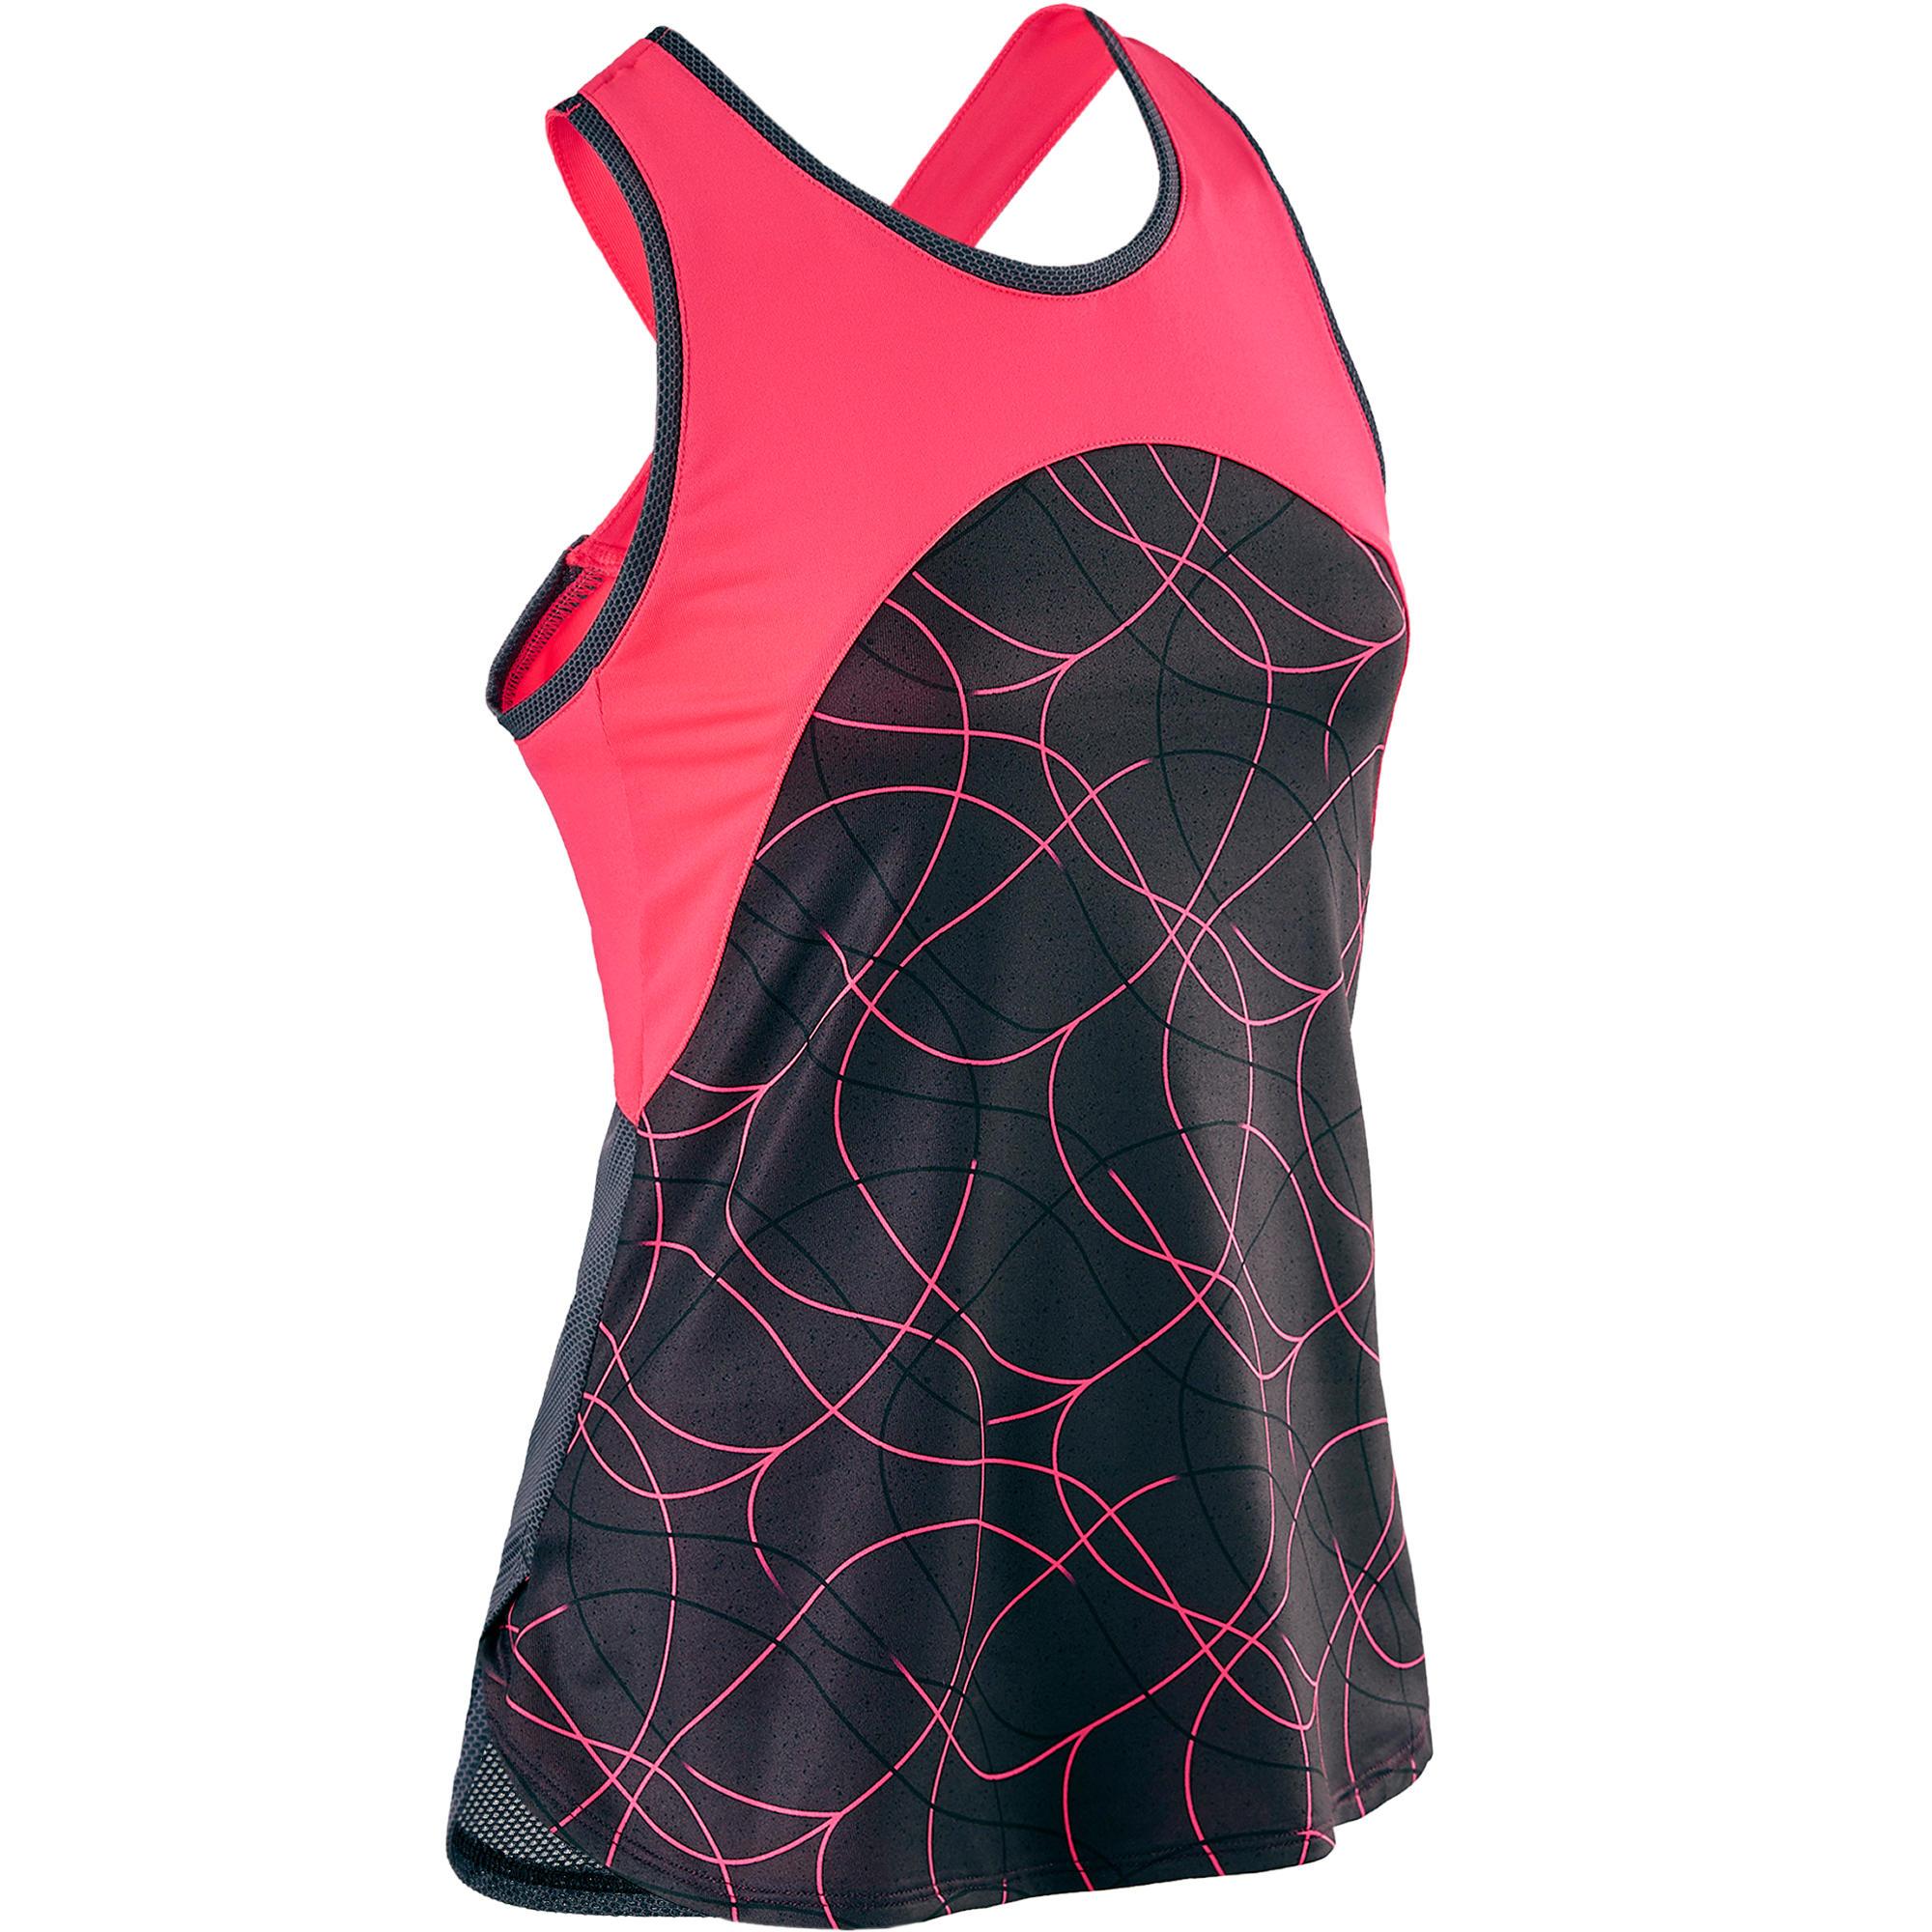 395921d96 Comprar Ropa de Niña Fitness Online | Decathlon